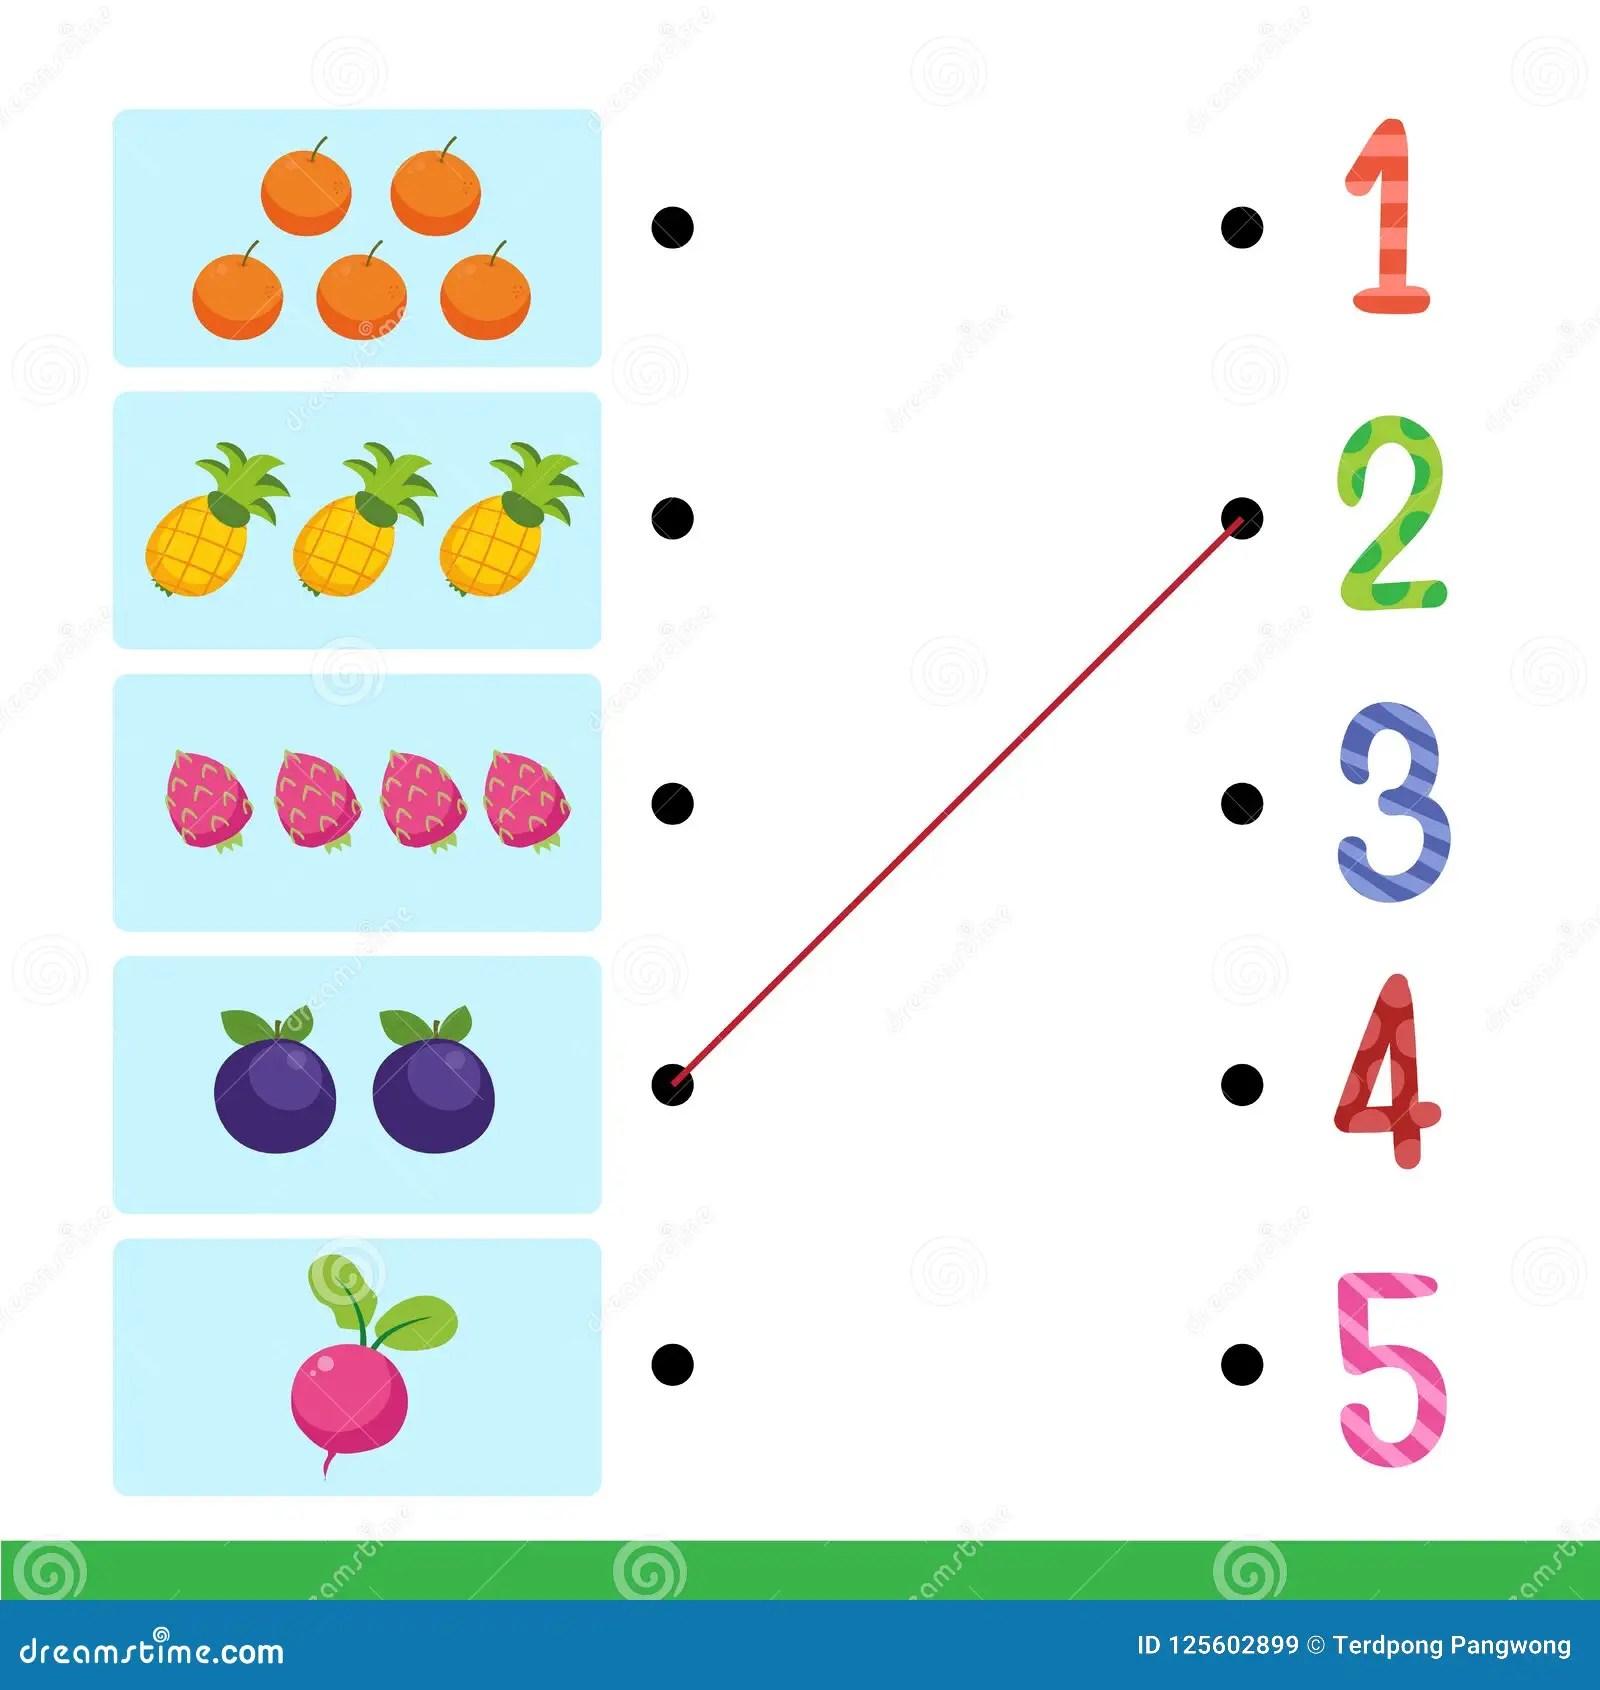 Worksheet Vector Design For Kid Stock Vector